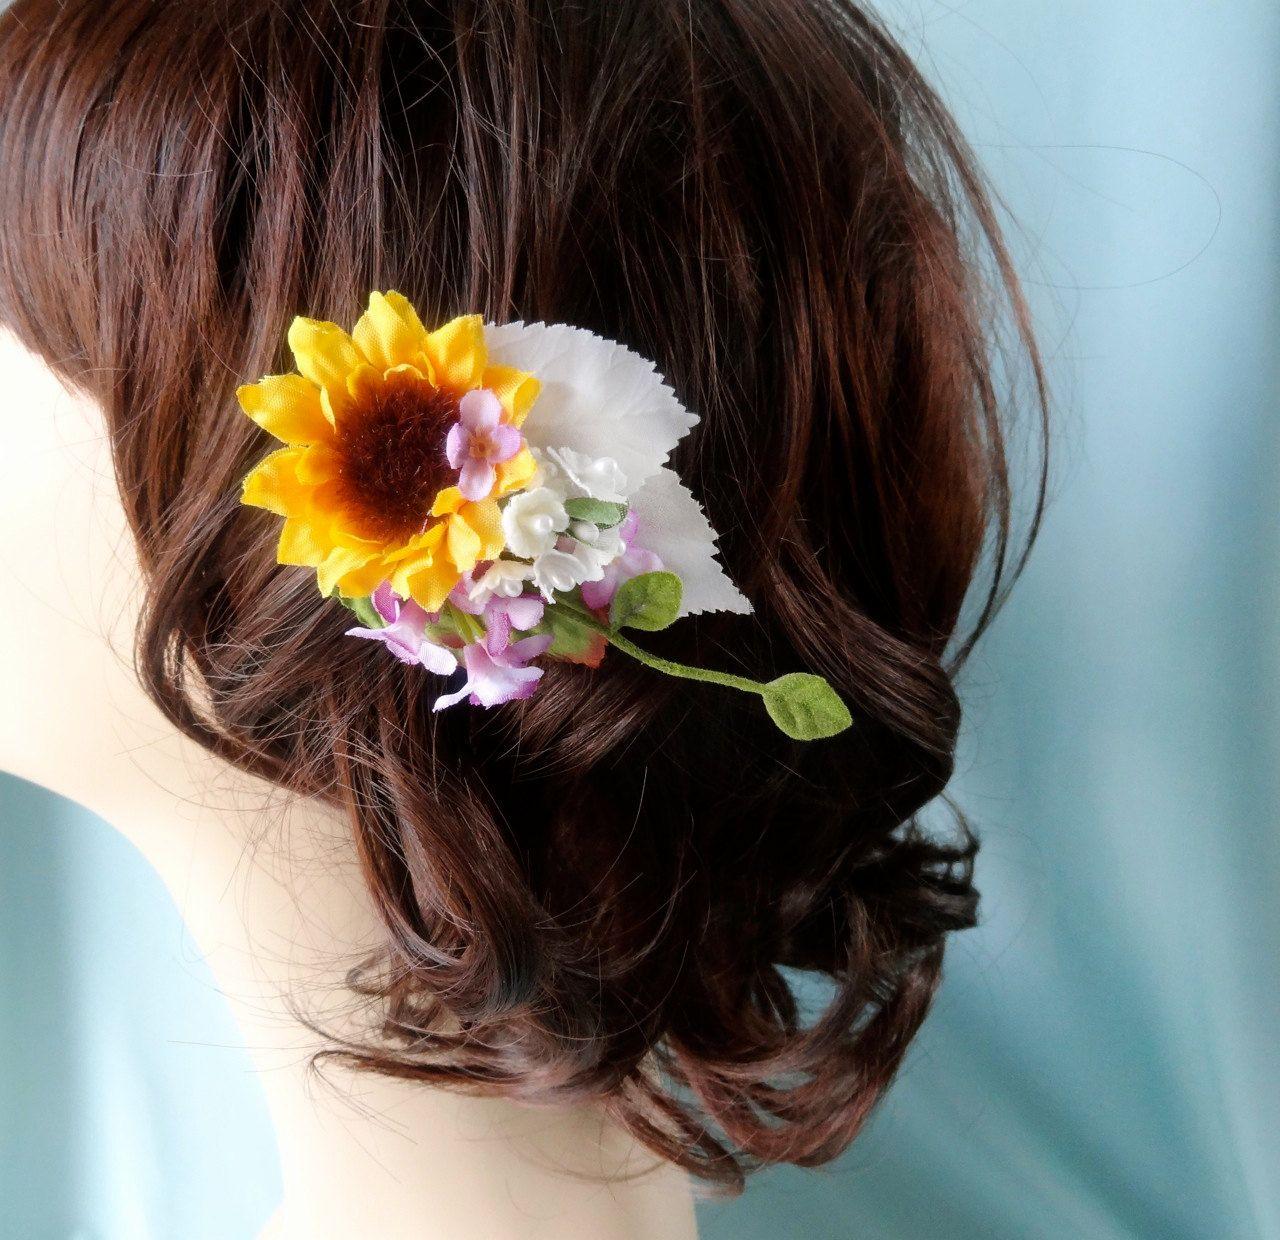 small sunflower hair clip, bridal hair accessory, yellow flower girl accessories - HONEYBEE - wildflower rustic wedding, purple flower. $40.00, via Etsy.